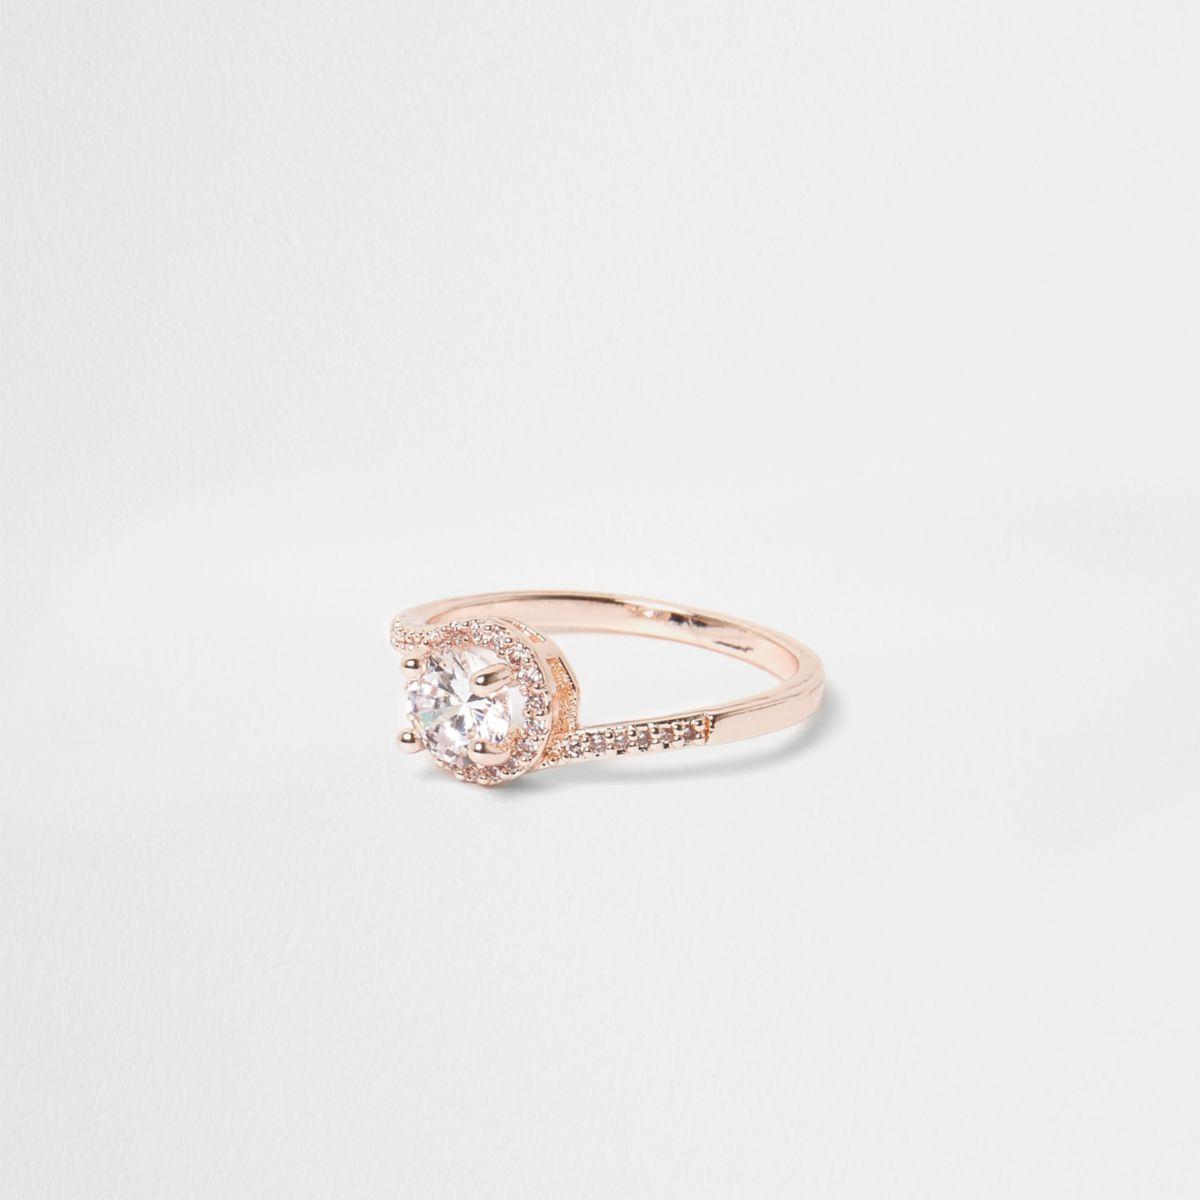 Rose gold tone diamante pave ring